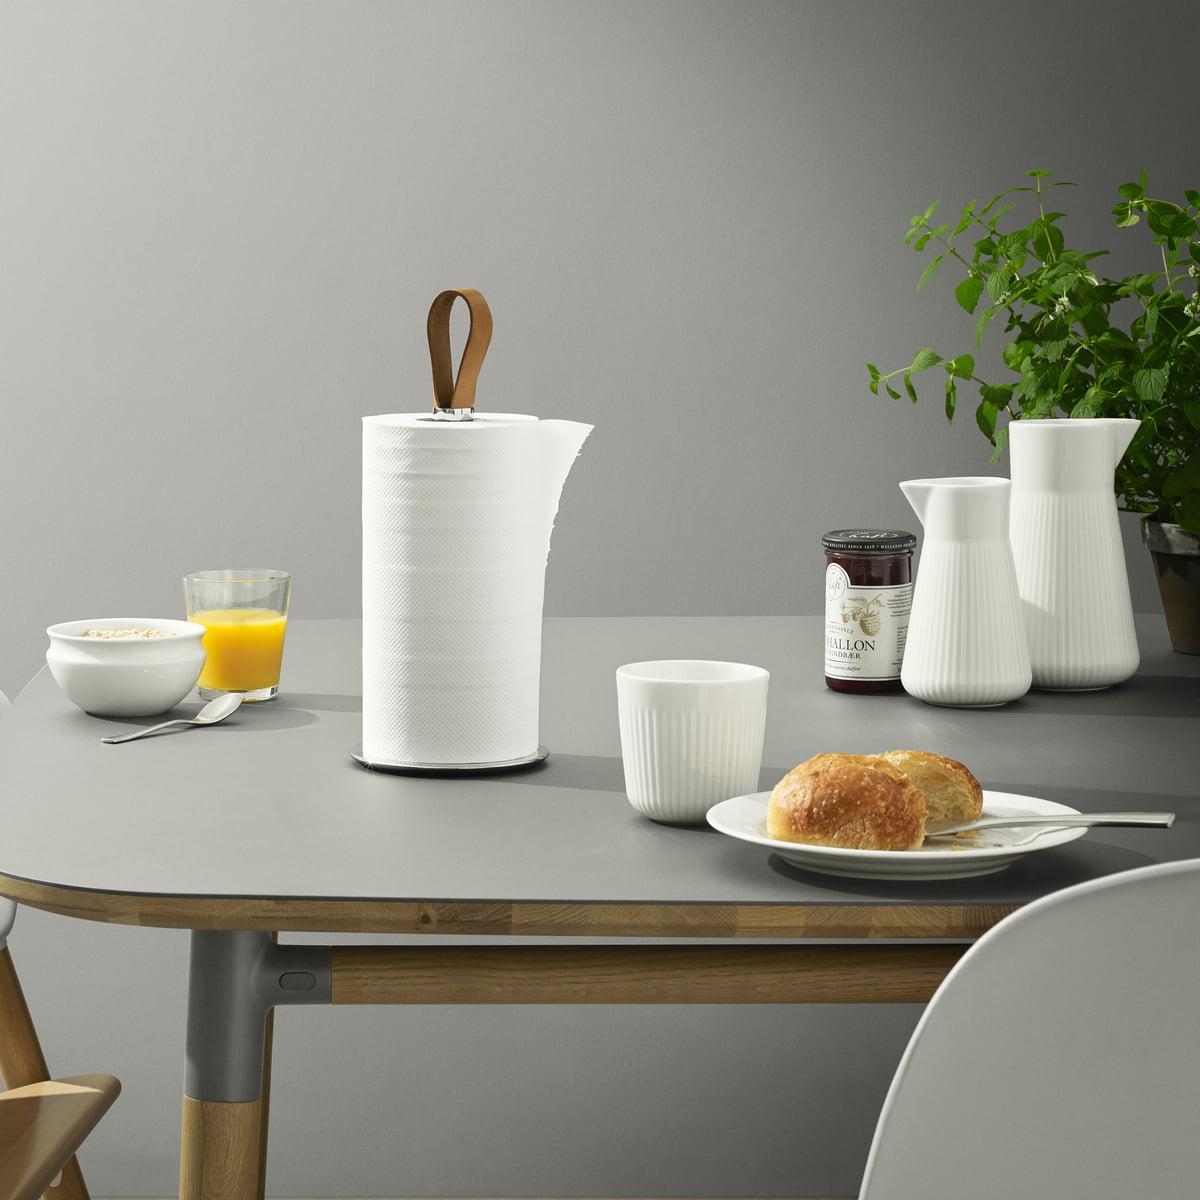 kitchen roll holder by eva solo in the shop. Black Bedroom Furniture Sets. Home Design Ideas